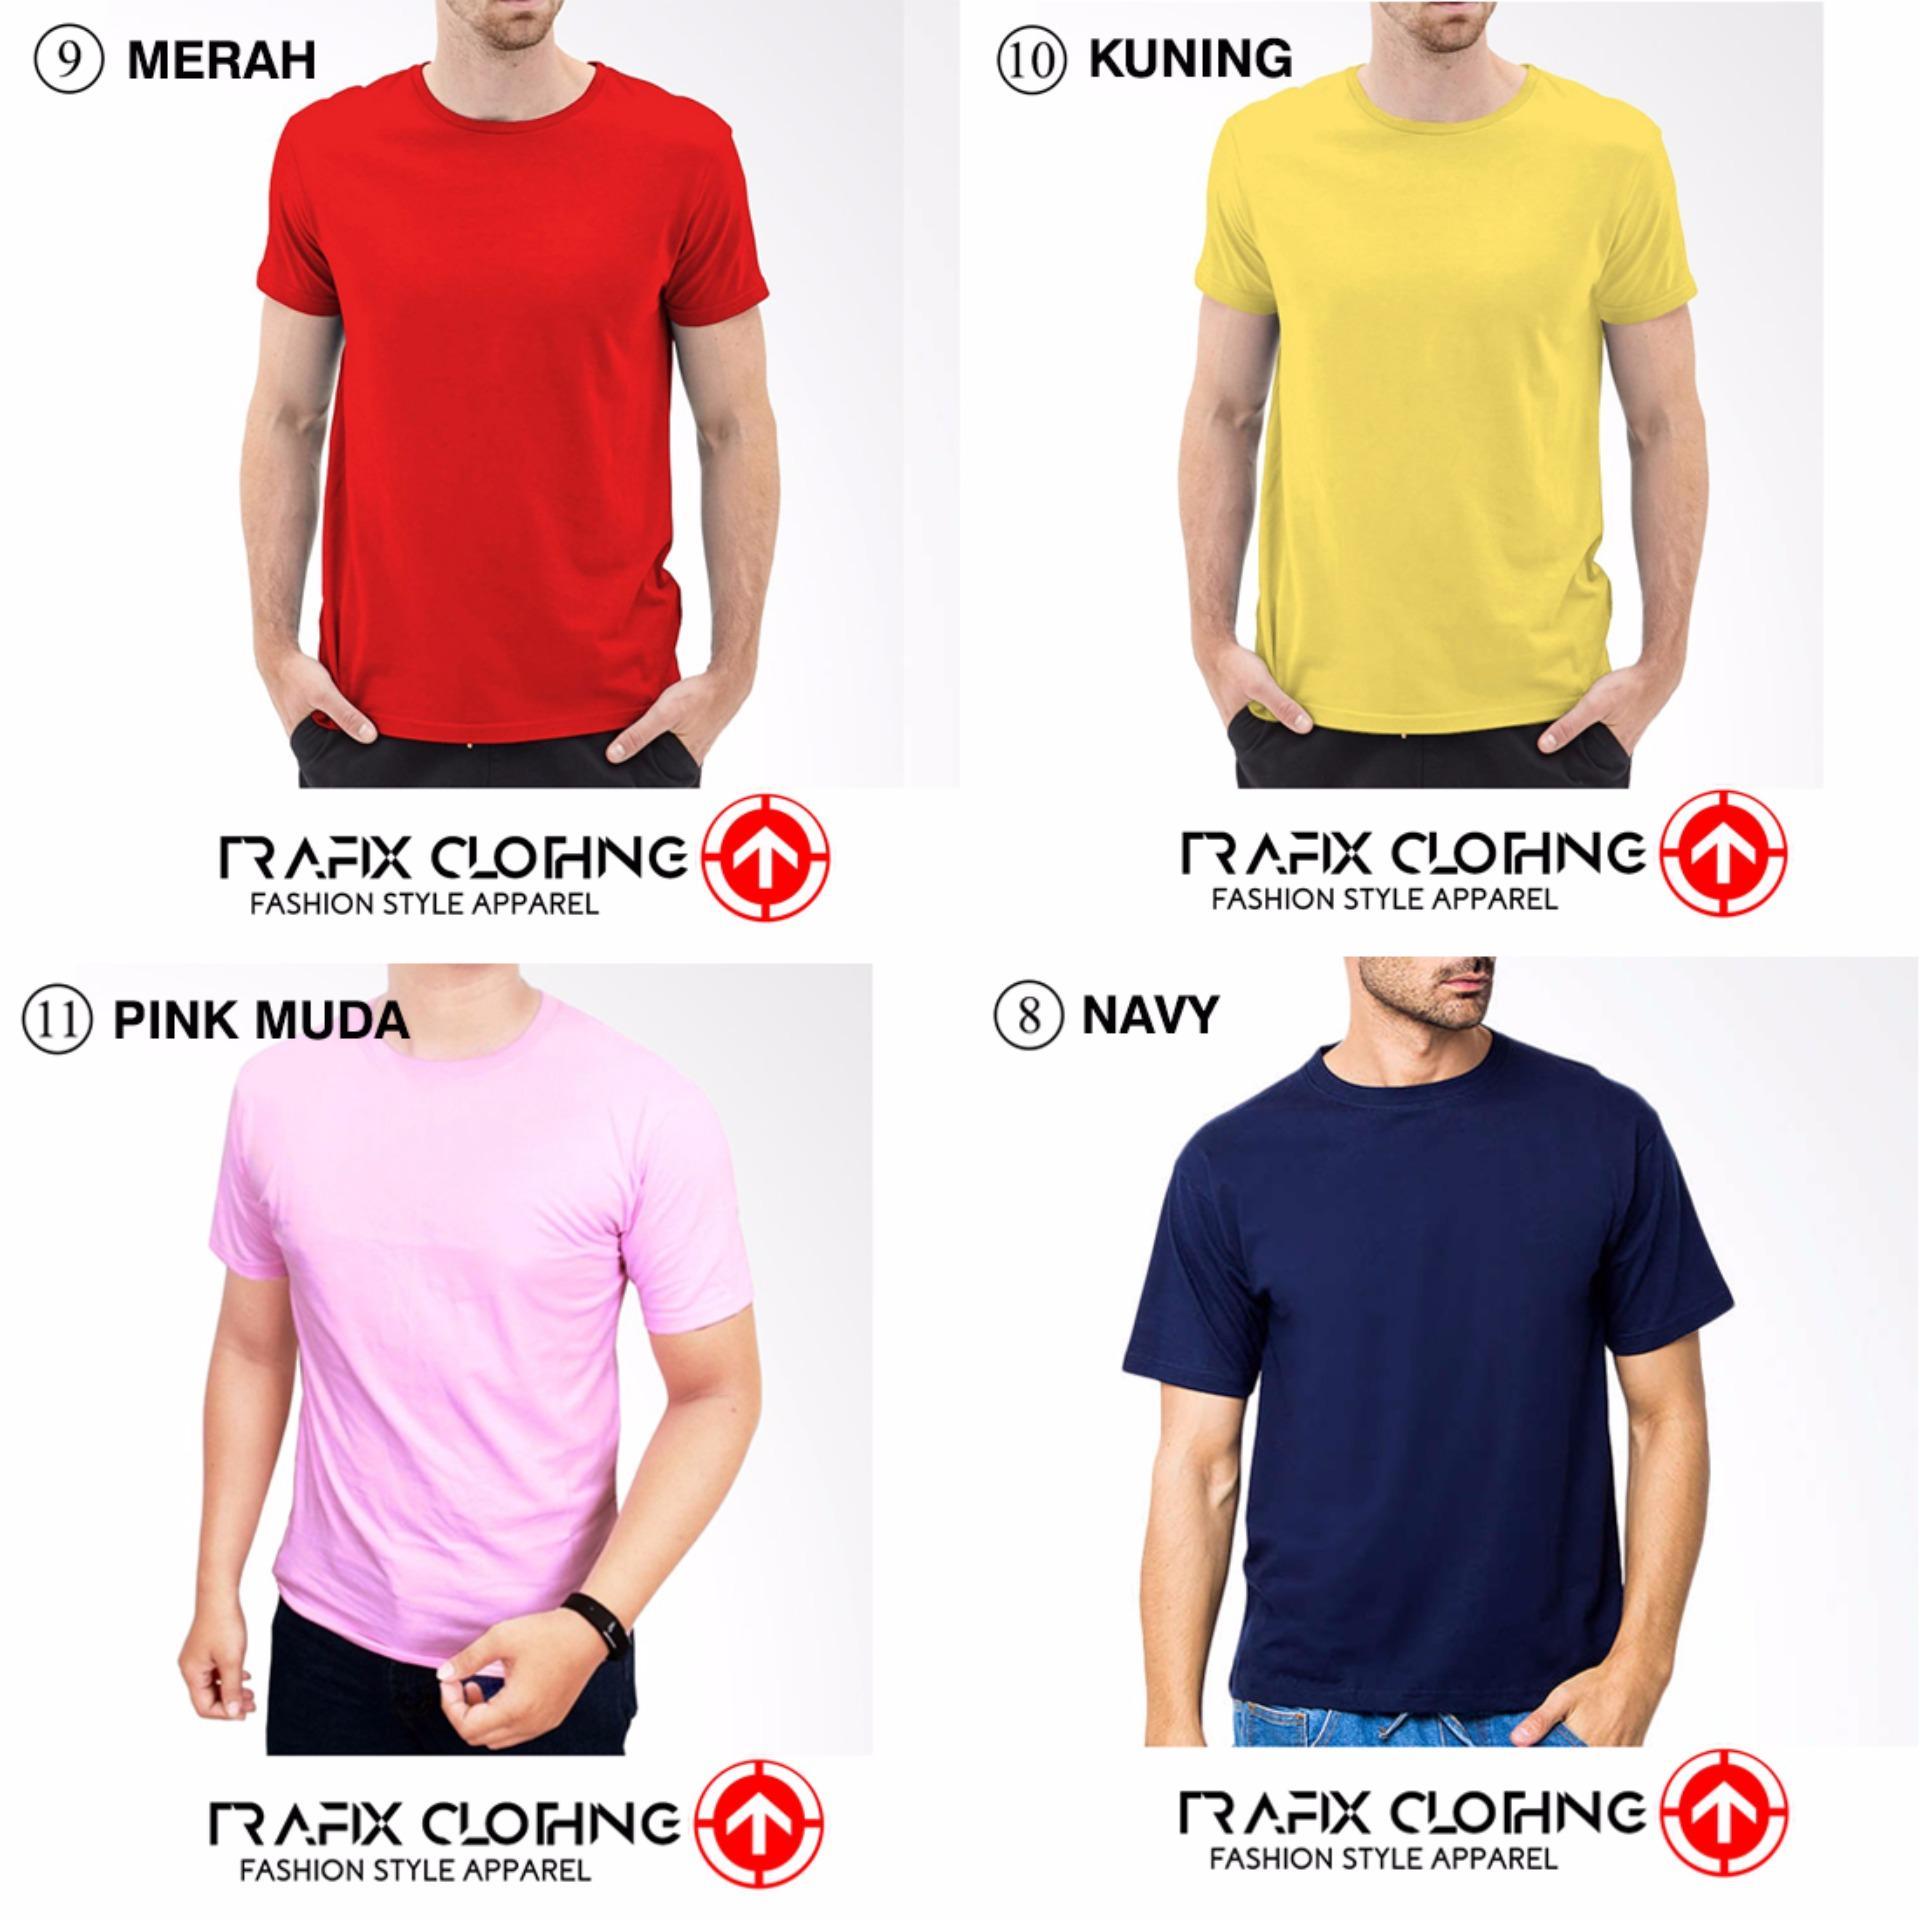 Kaos Polos Two Tune Pria T Shirt By Hnr Soerabaja Hitam Misty Navy Source Atasan